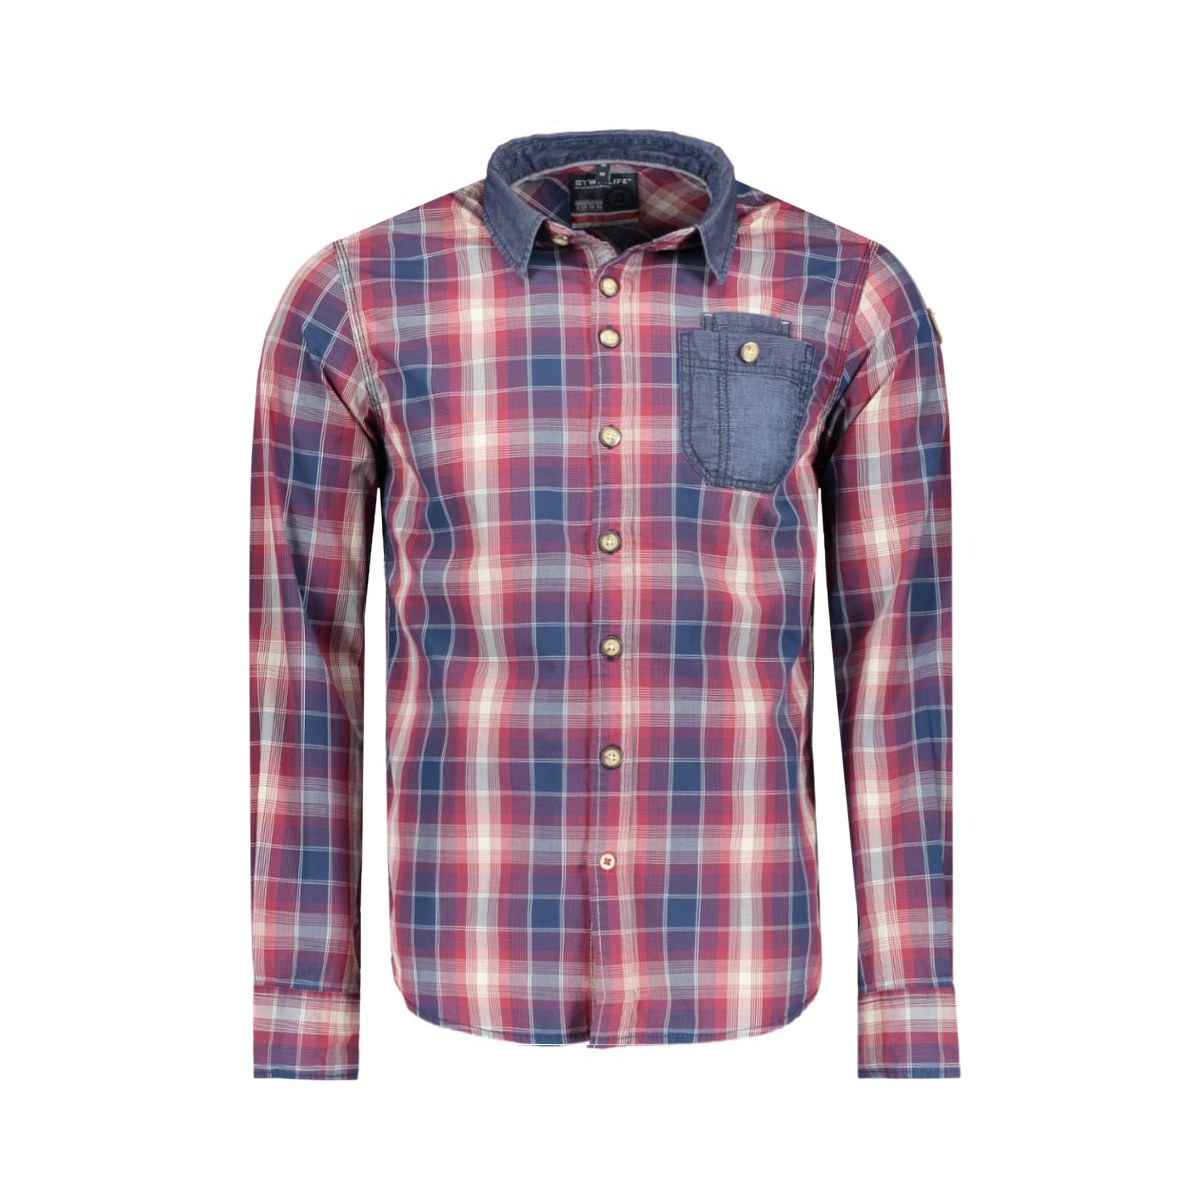 msh651608 twinlife overhemd 4504